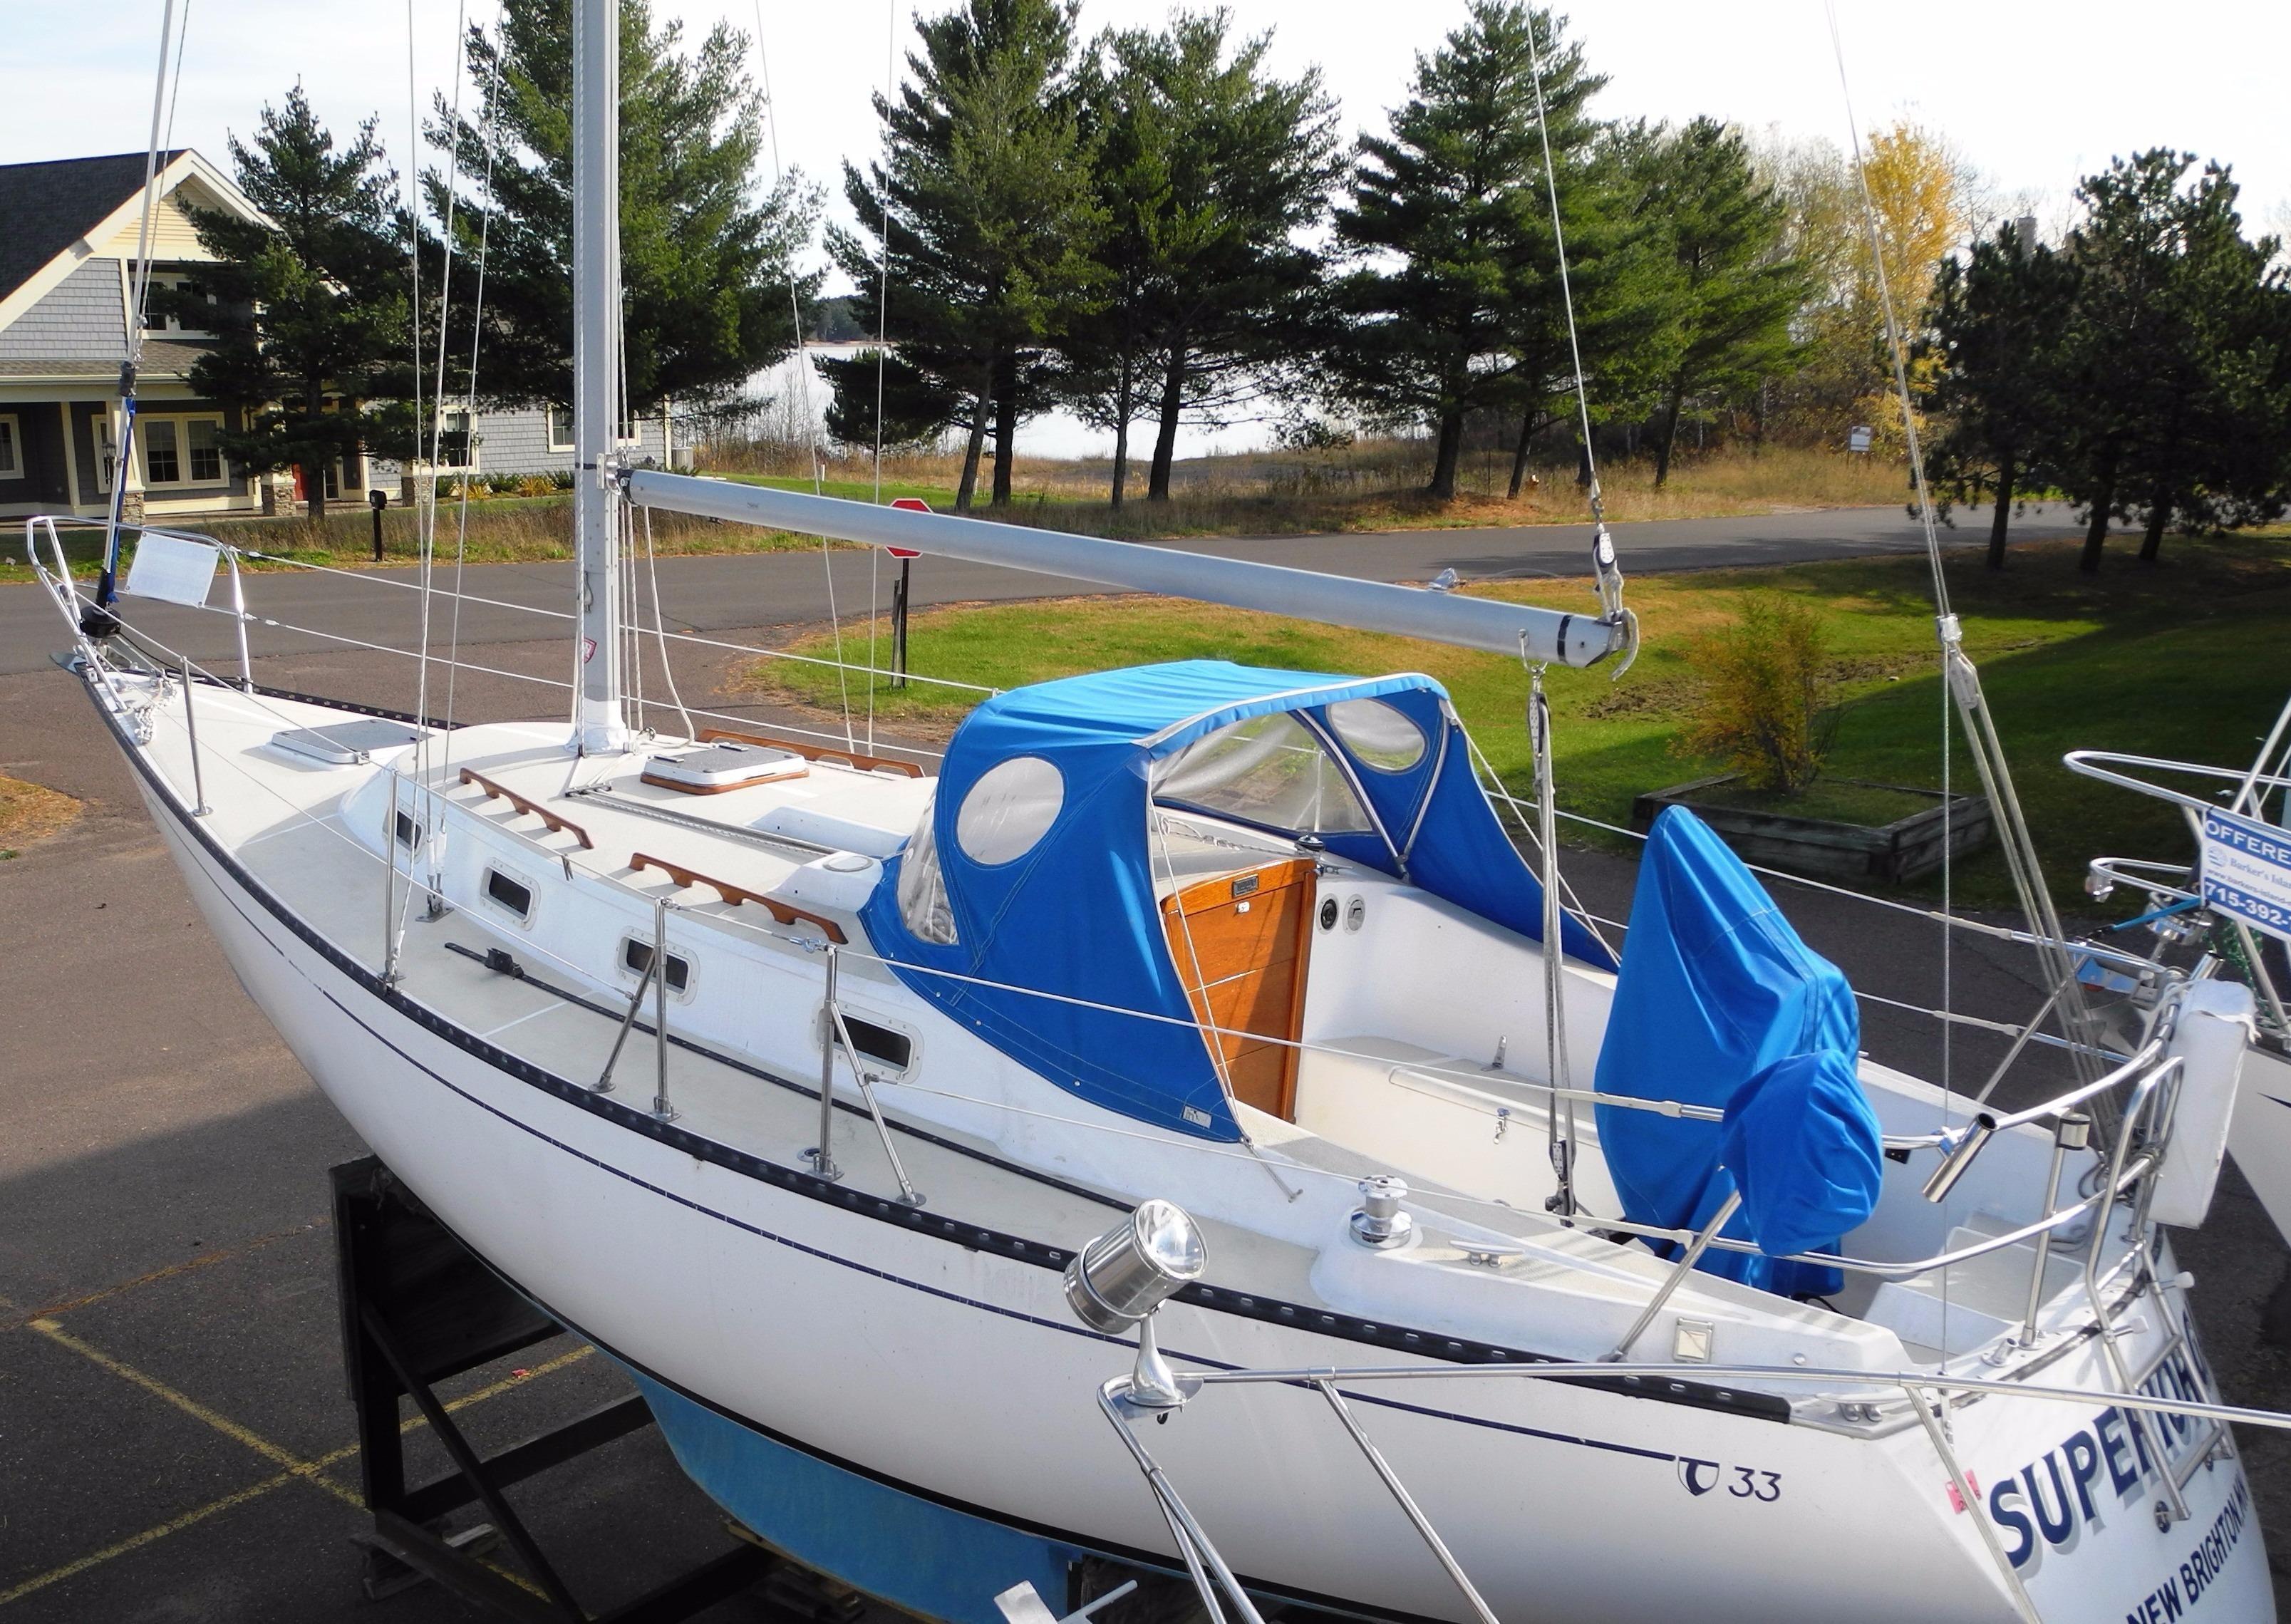 1986 Tartan Soverel 33 Sailboat Transport: 1984 Tartan 33 Cruiser For Sale